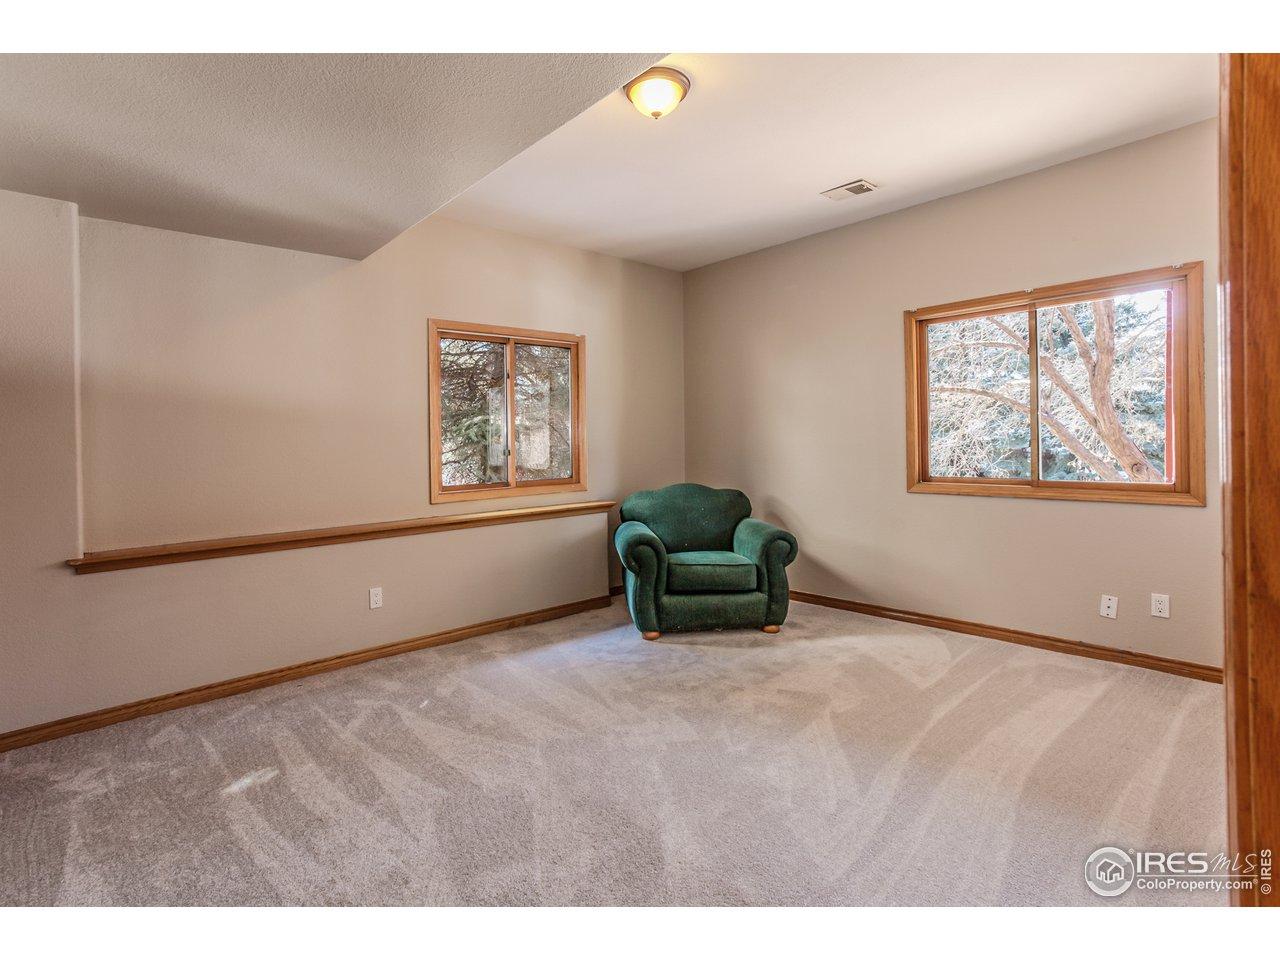 4th bedroom - basement